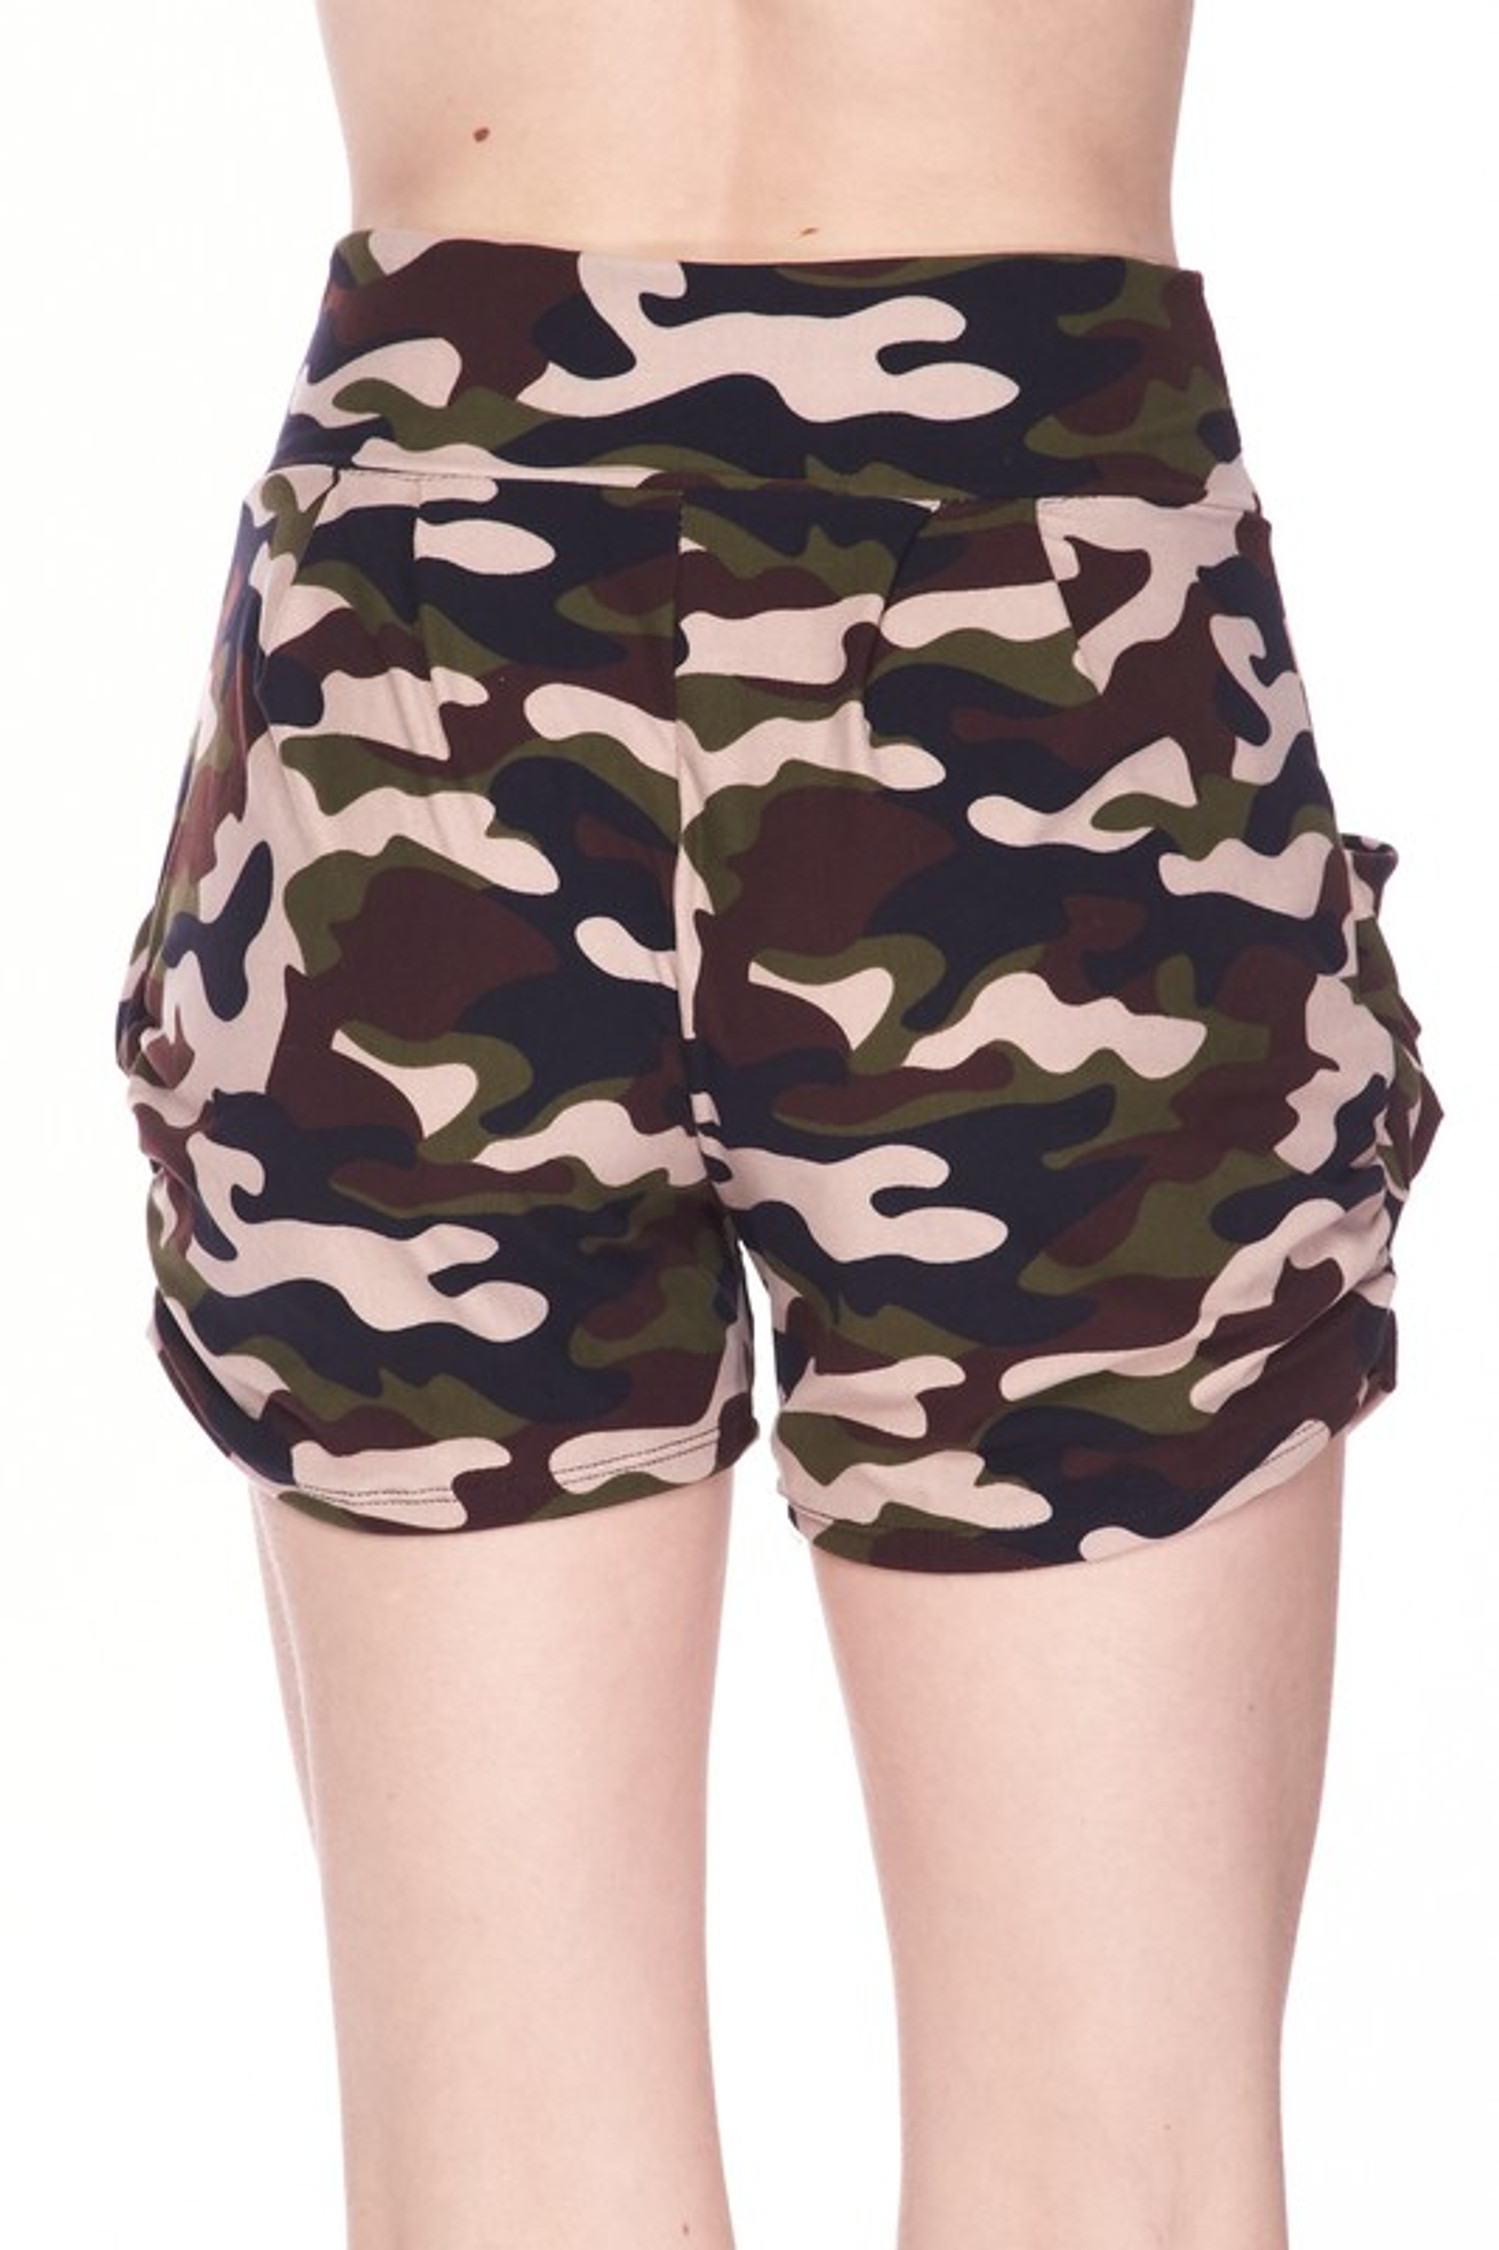 Buttery Soft Flirty Camouflage Plus Size Harem Shorts